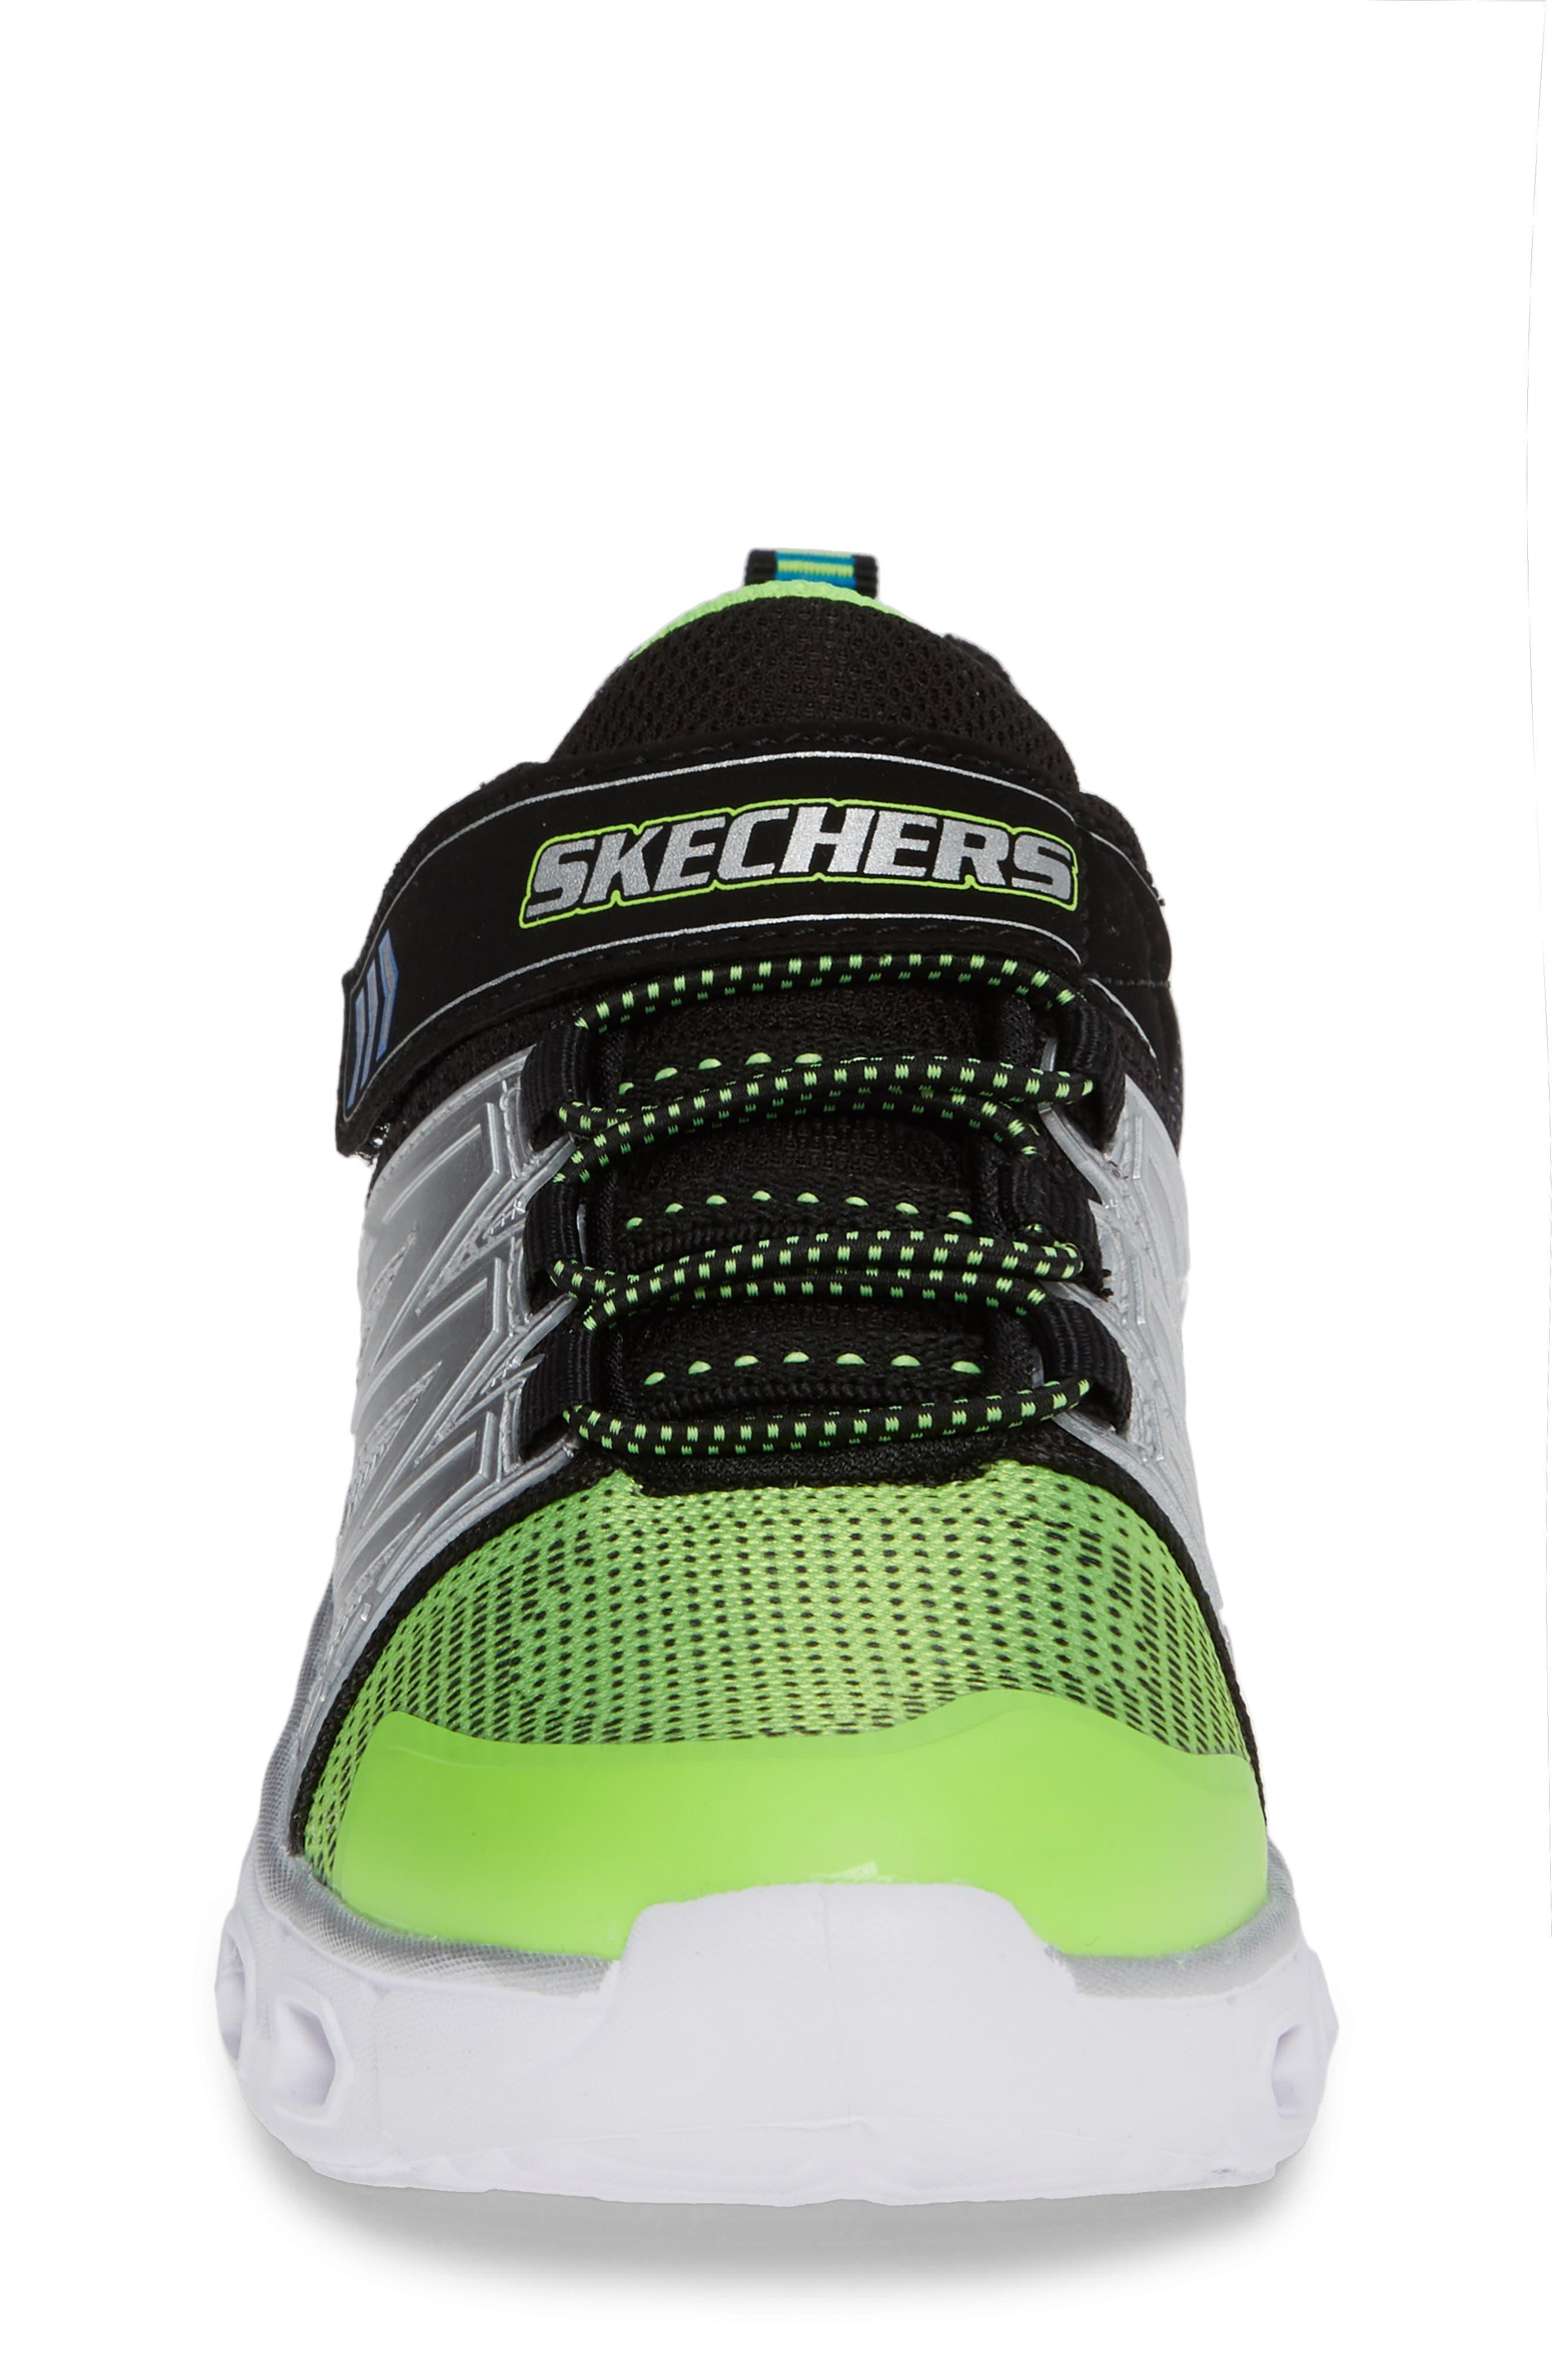 Hypno-Flash 2.0 Sneakers,                             Alternate thumbnail 7, color,                             Lime/ Black